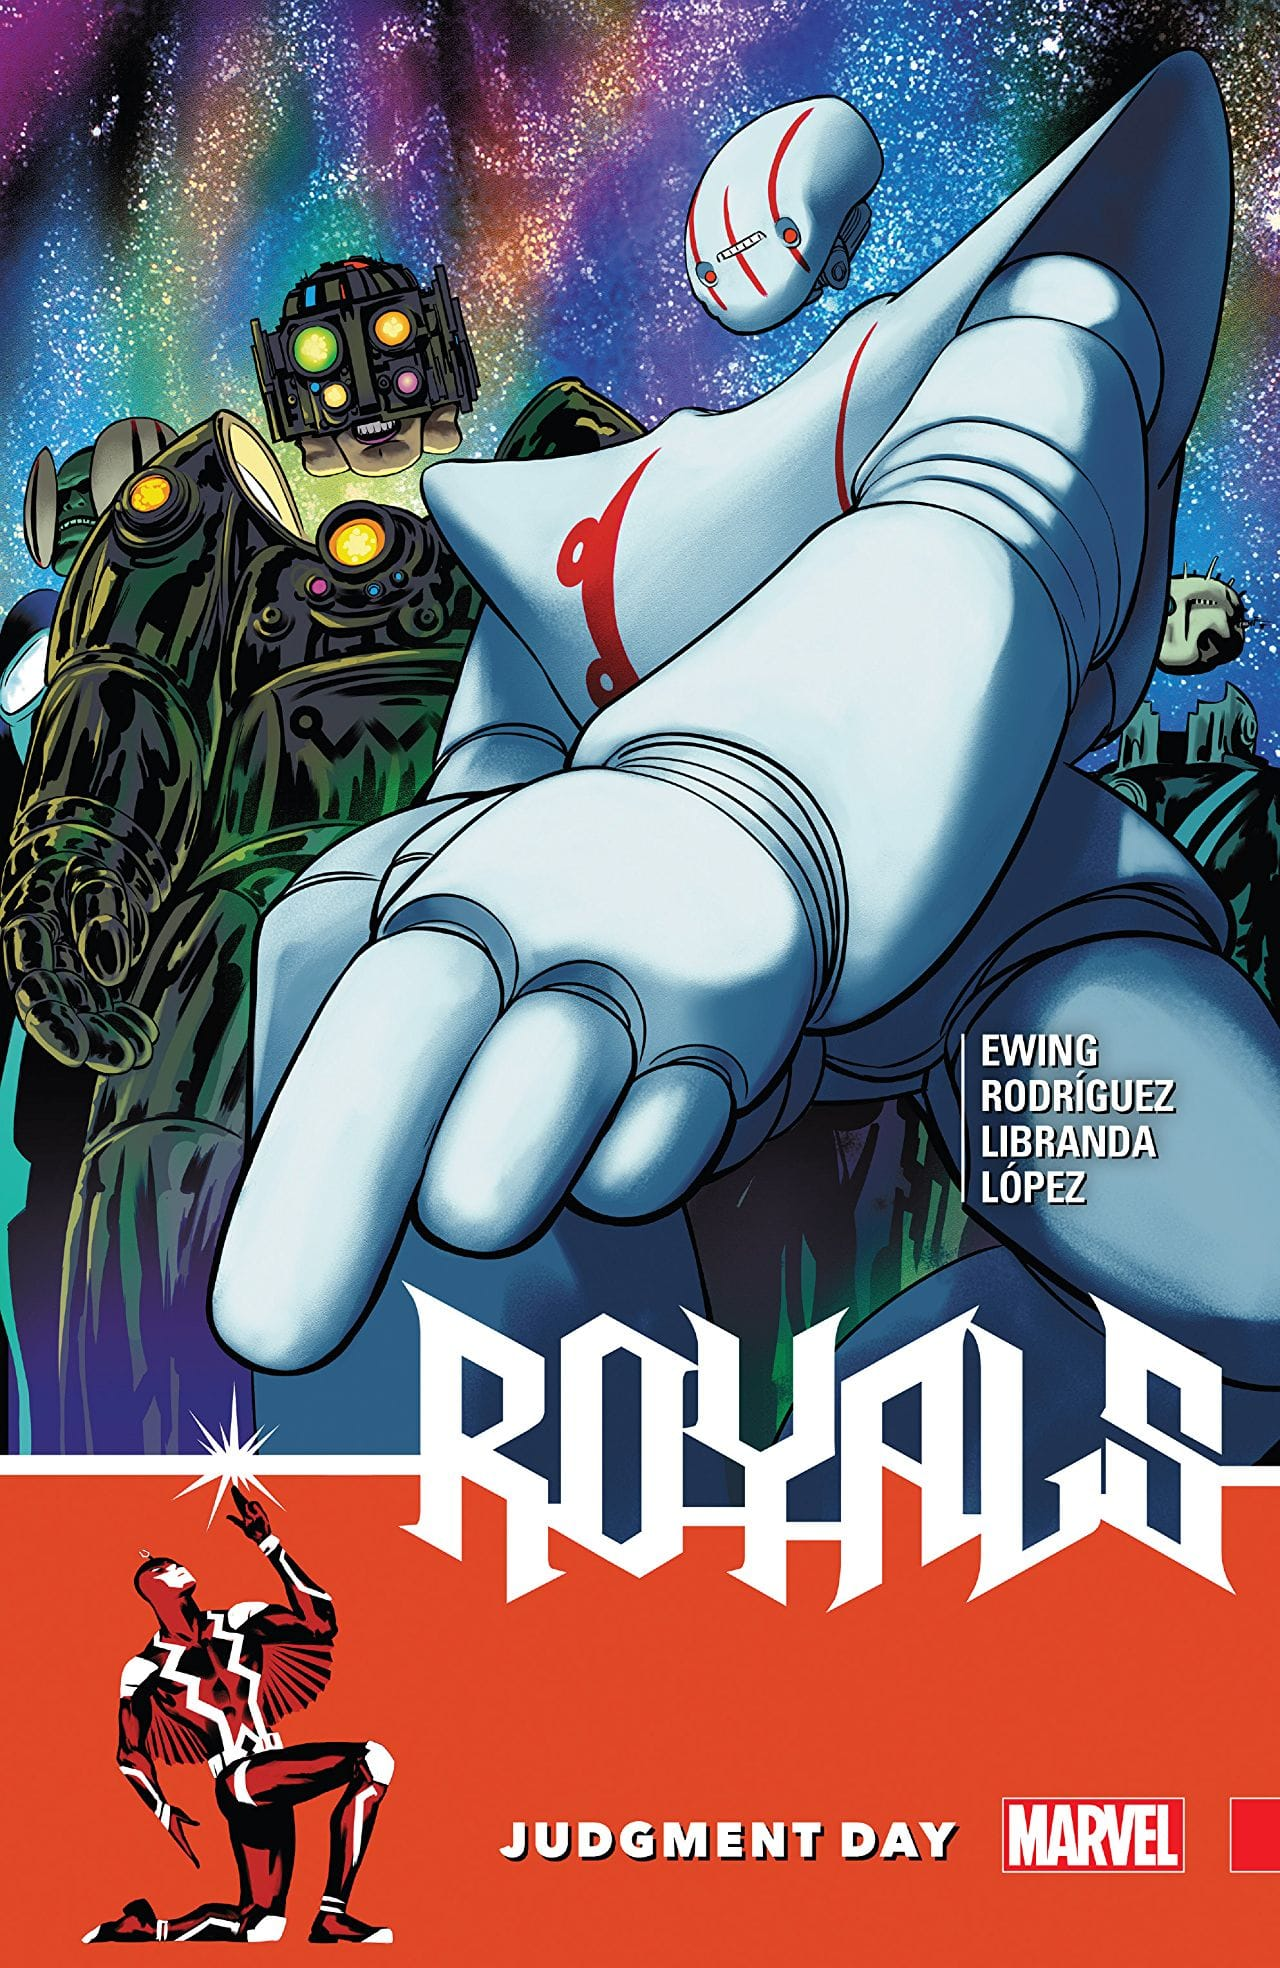 'Royals Vol. 2: Judgment Day' is a solid ending to a unique Inhuman saga